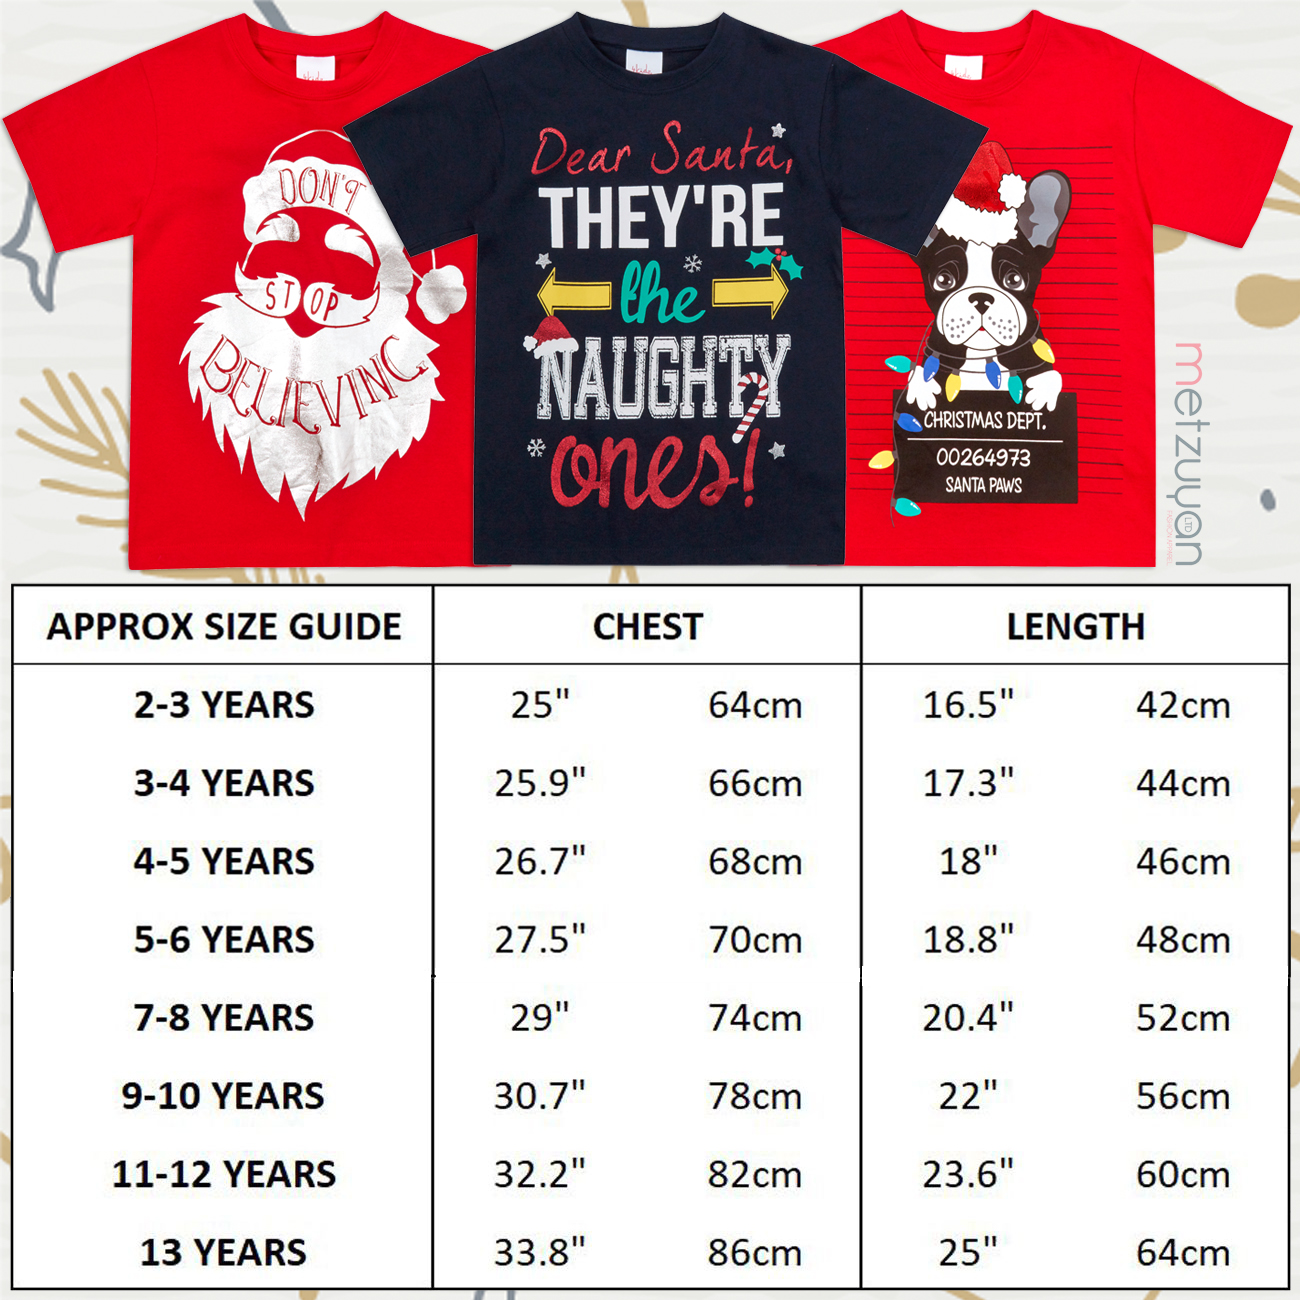 Childrens-Girls-Boys-Xmas-T-Shirts-Printed-Christmas-Design-100-Cotton-2-13-Yrs thumbnail 17